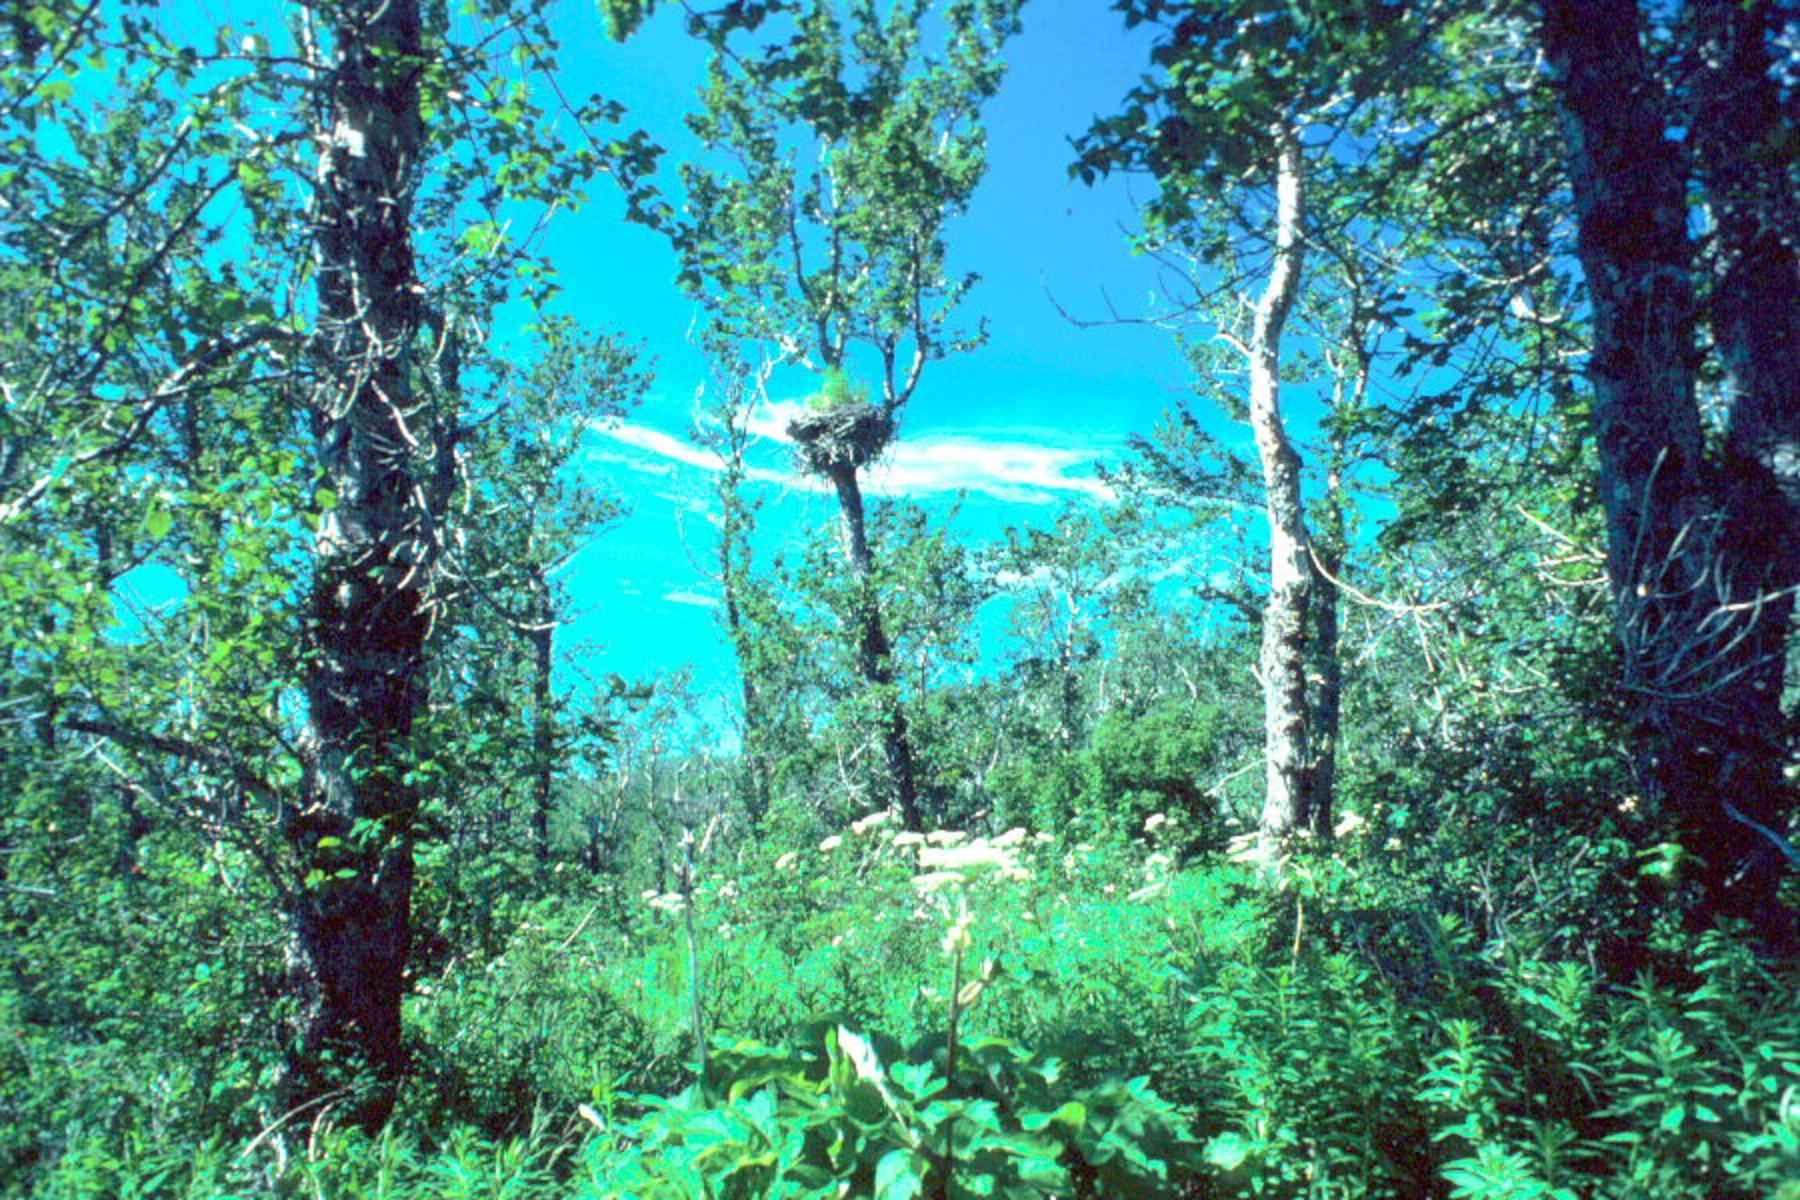 Free Picture Bald Eagle Natural Habitat Eagles Nest Tree